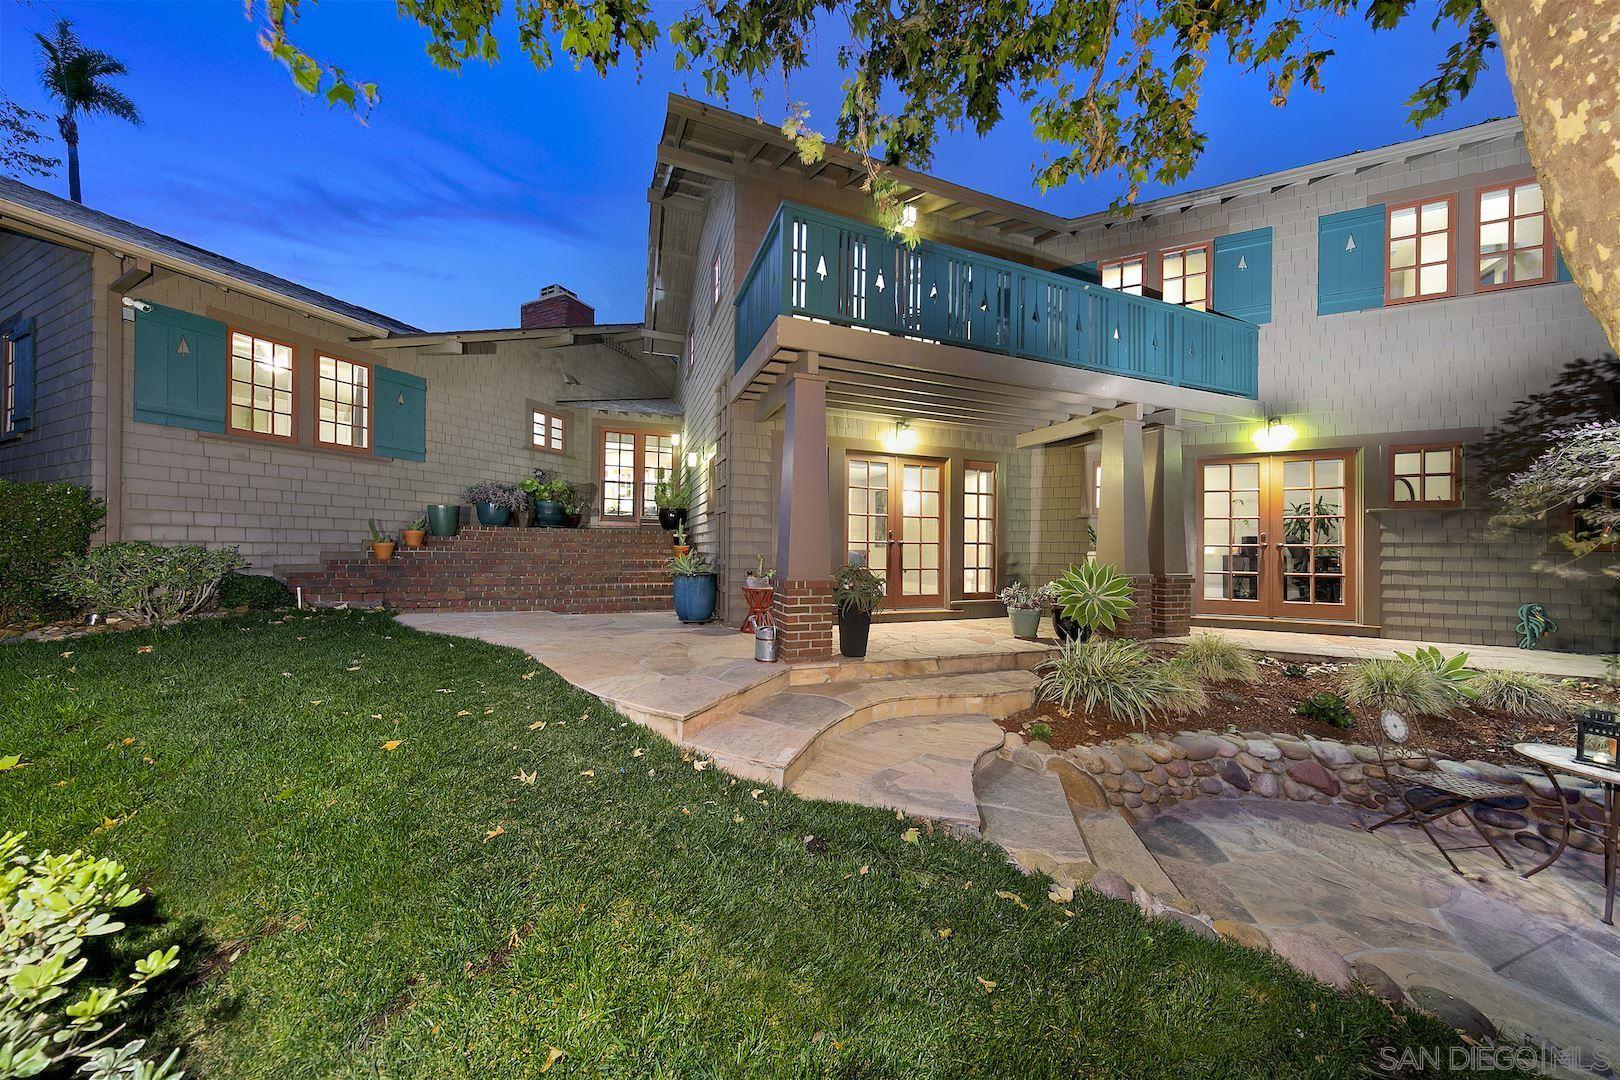 Photo of 4355 Hortensia St, San Diego, CA 92103 (MLS # 210009558)